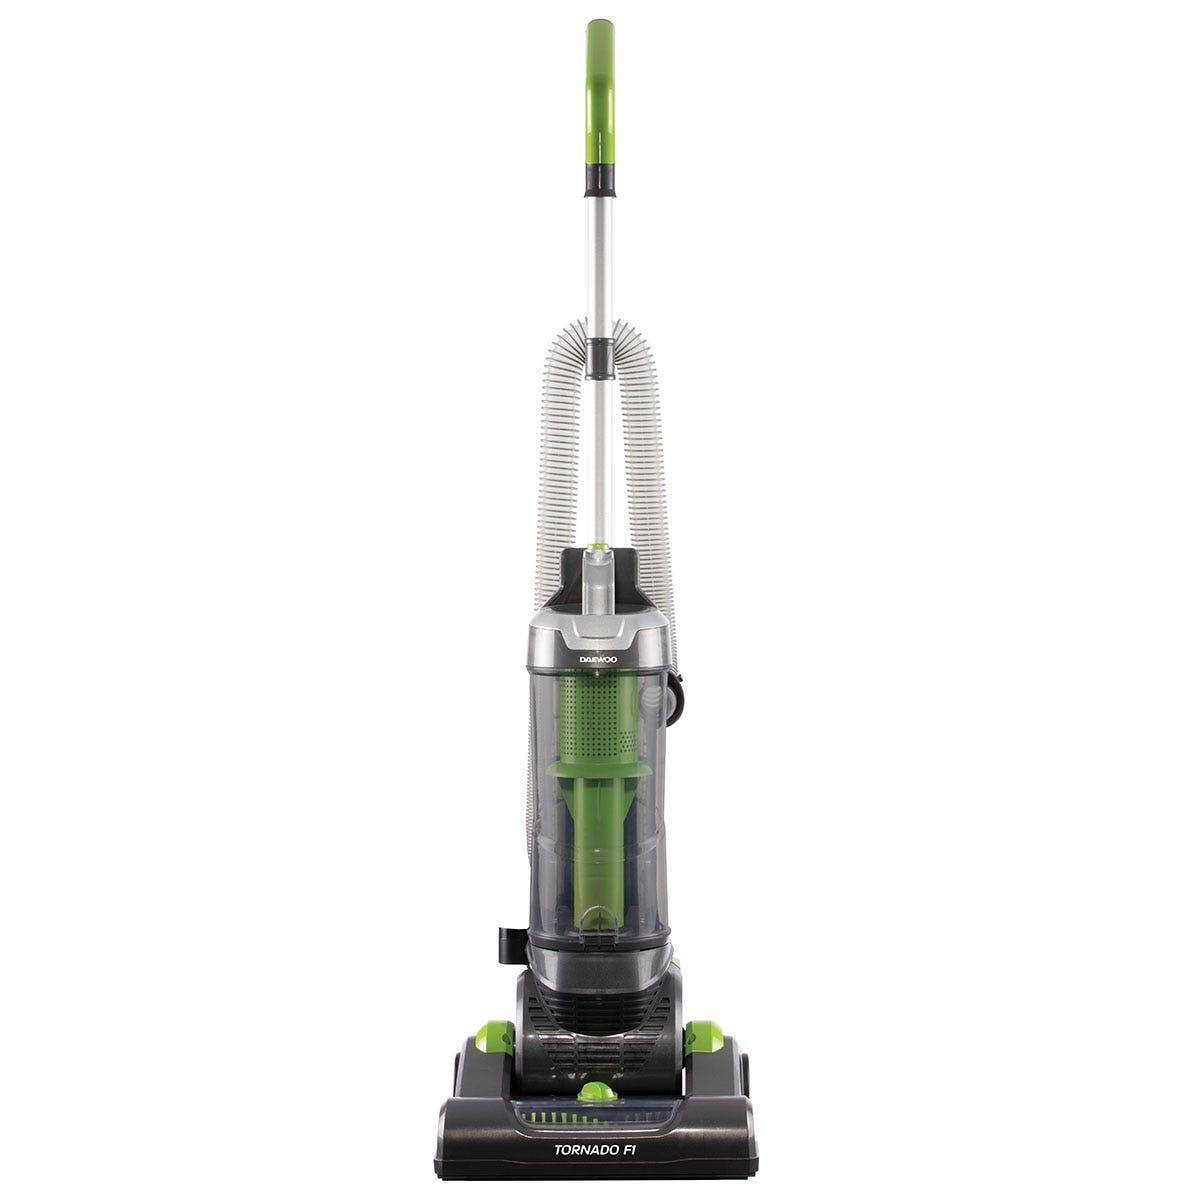 Daewoo FLR00049GE Tornado F1 750W Upright Vacuum Cleaner - Grey, Green, and Black